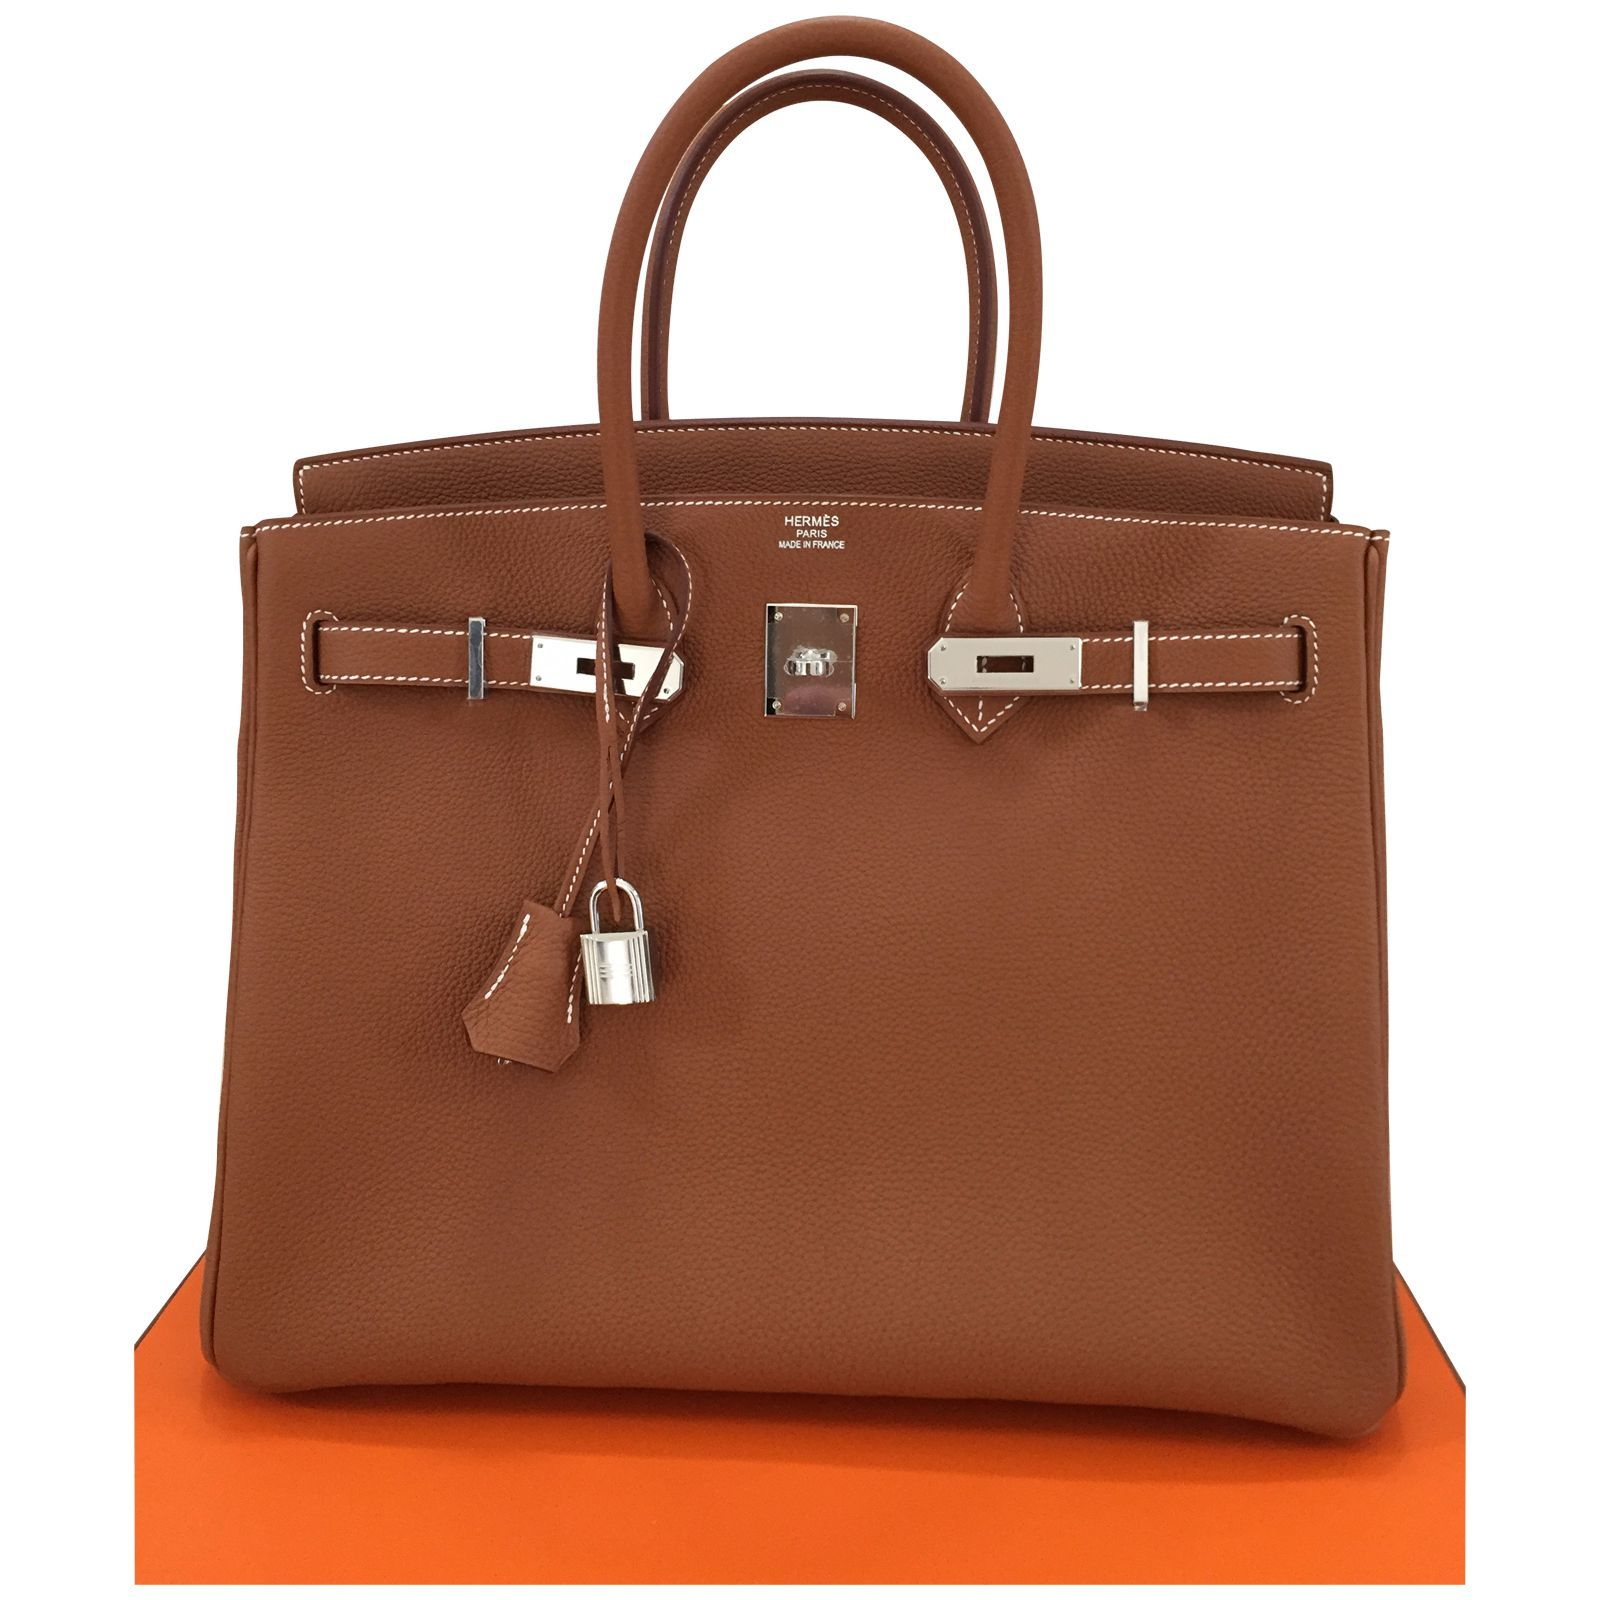 Sac Hermès Birkin 35 en cuir togo - couleur gold - bijouterie palladium -  stamp T a8aad9099aa